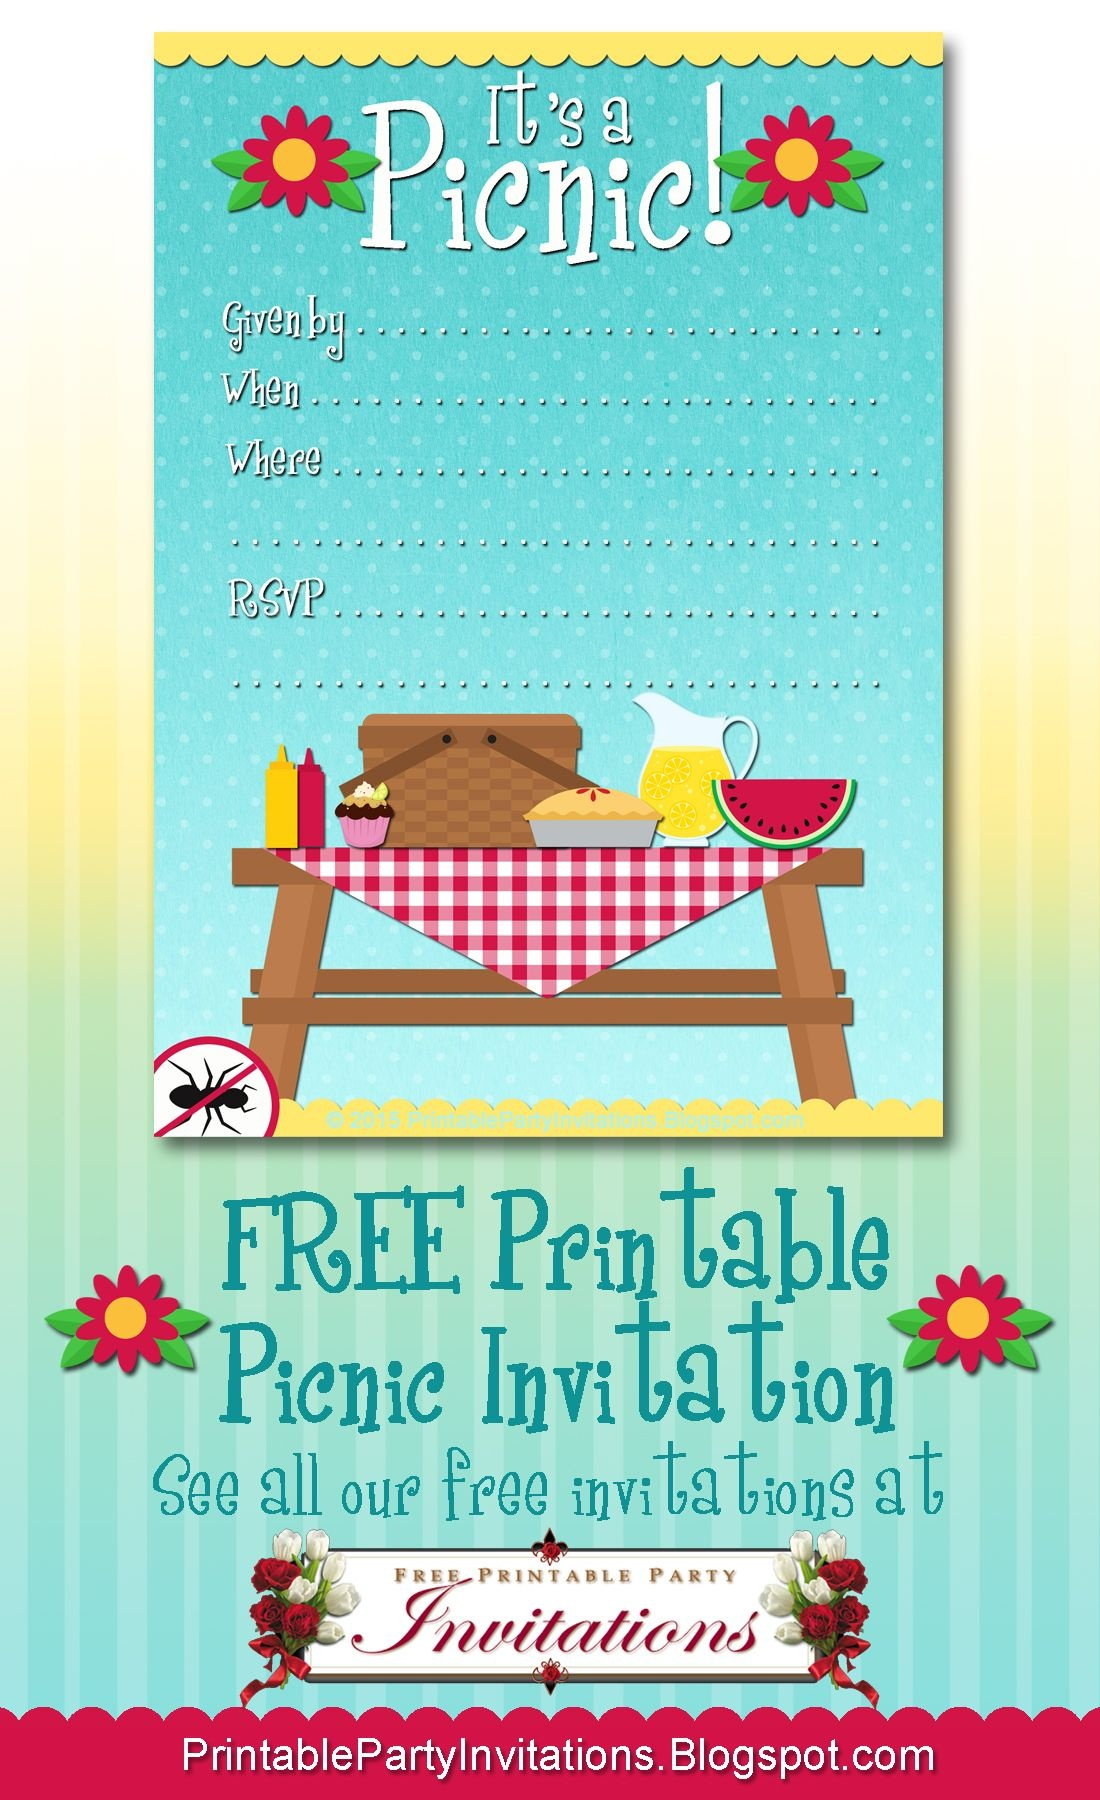 Free Printable Picnic Invitation | Party Printables | Picnic - Free Printable Flyers For Parties